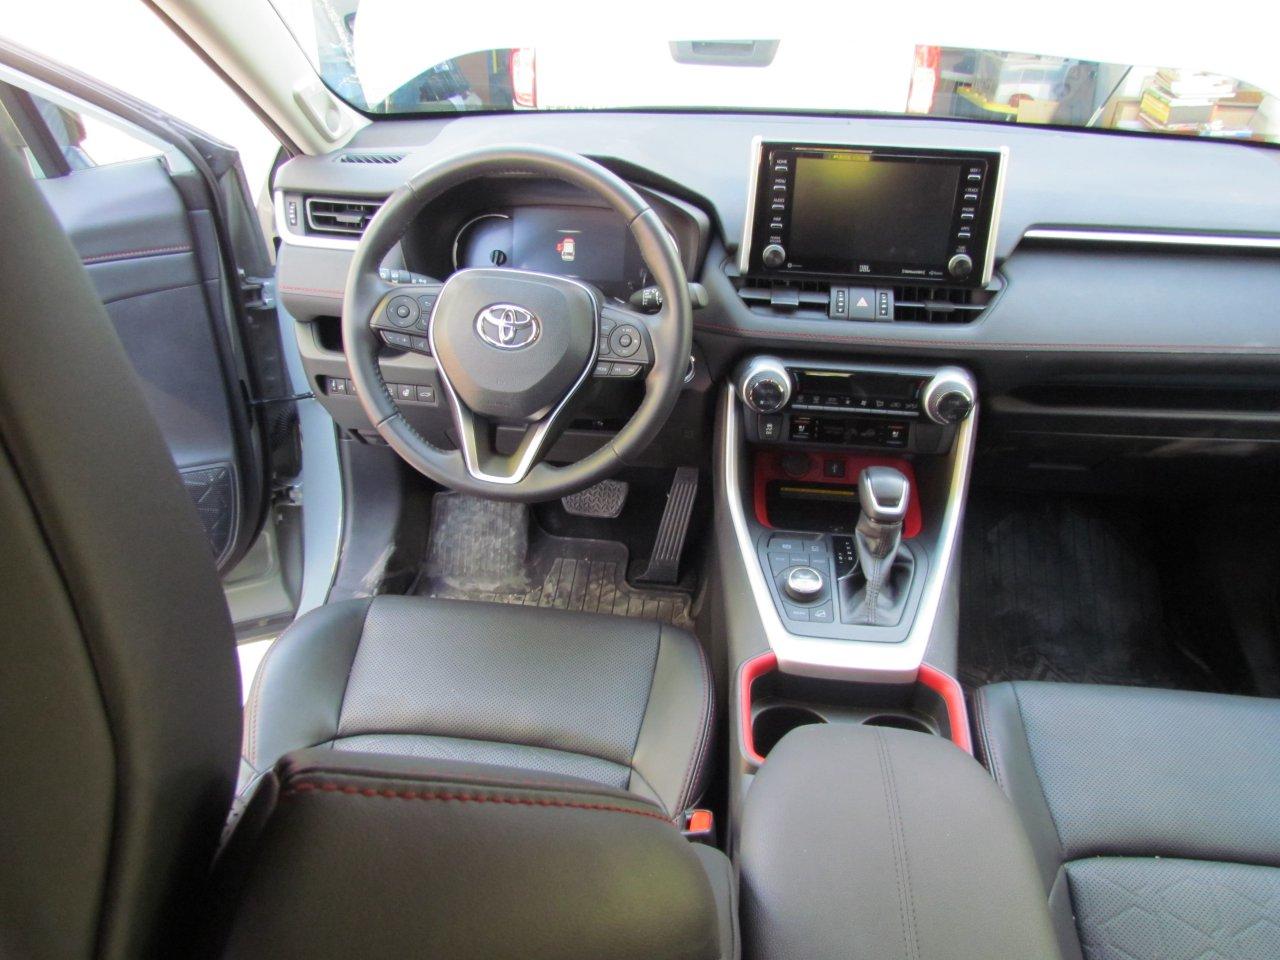 RAV4, Driven: TRD adds true off-road capability to Toyota's RAV4, ClassicCars.com Journal